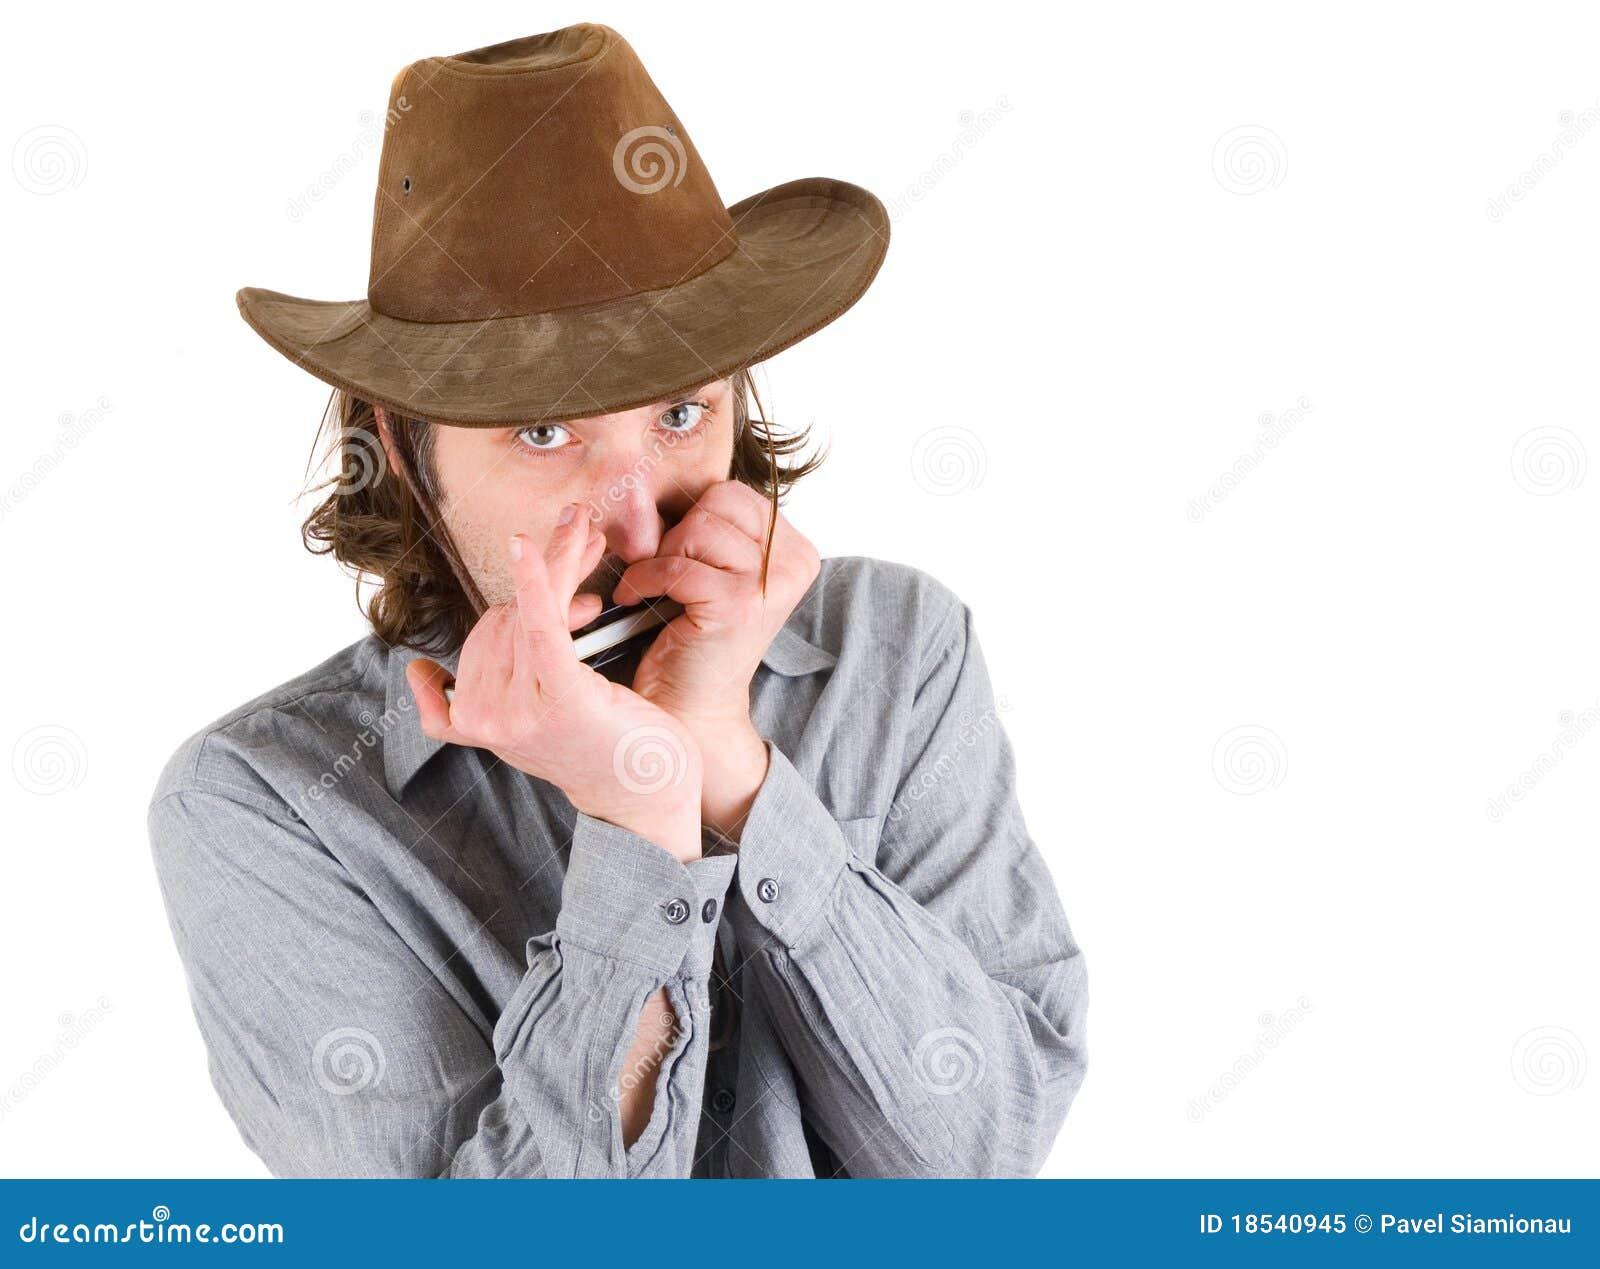 how to play mr tambourine man on harmonica